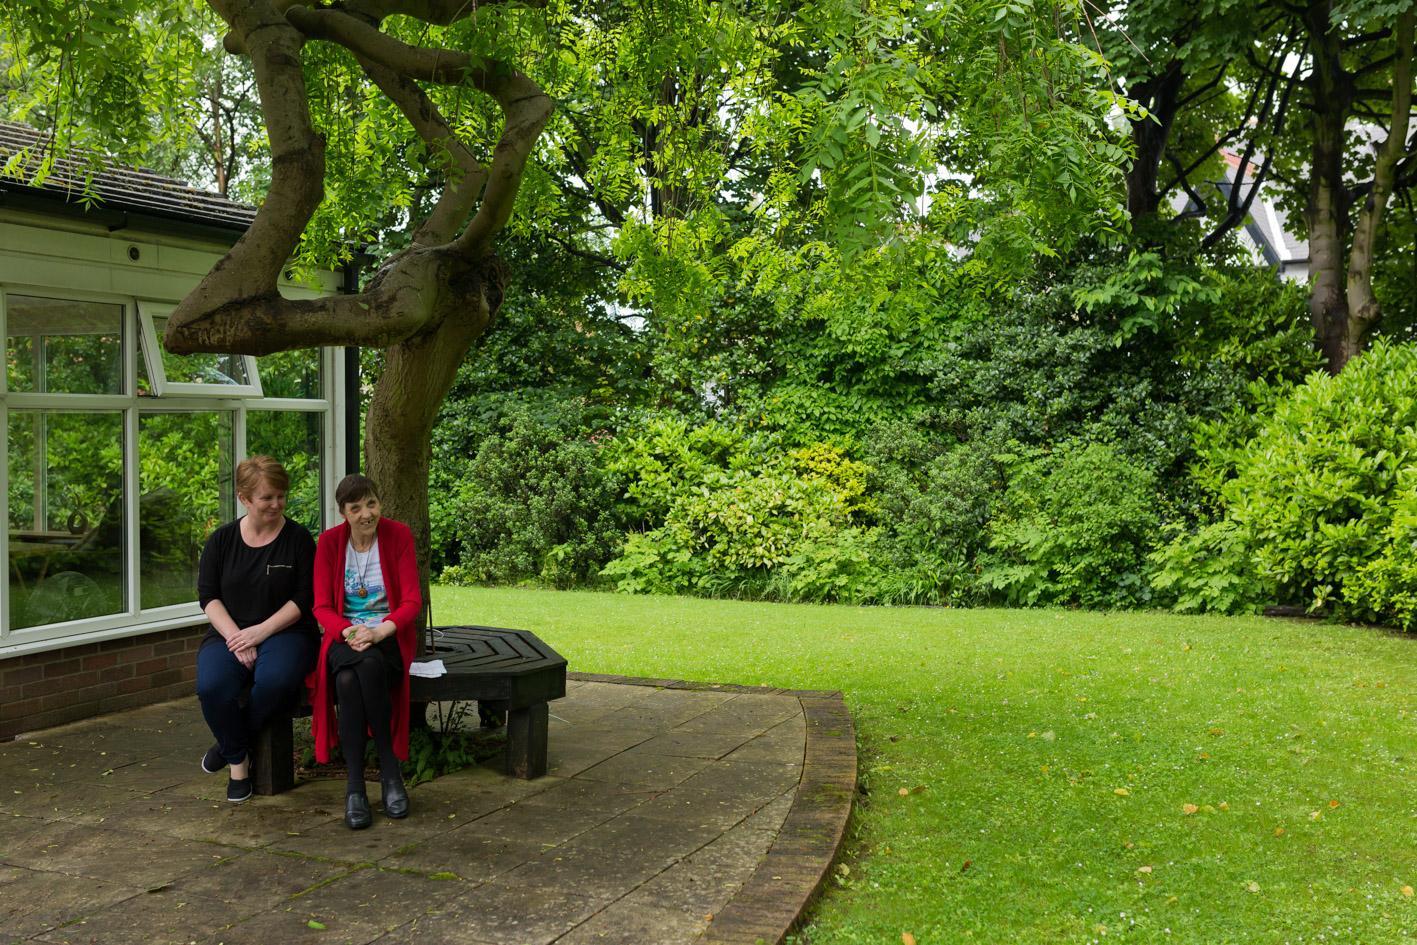 Shaftsbury House, garden, ladies sitting under tree, learning disability